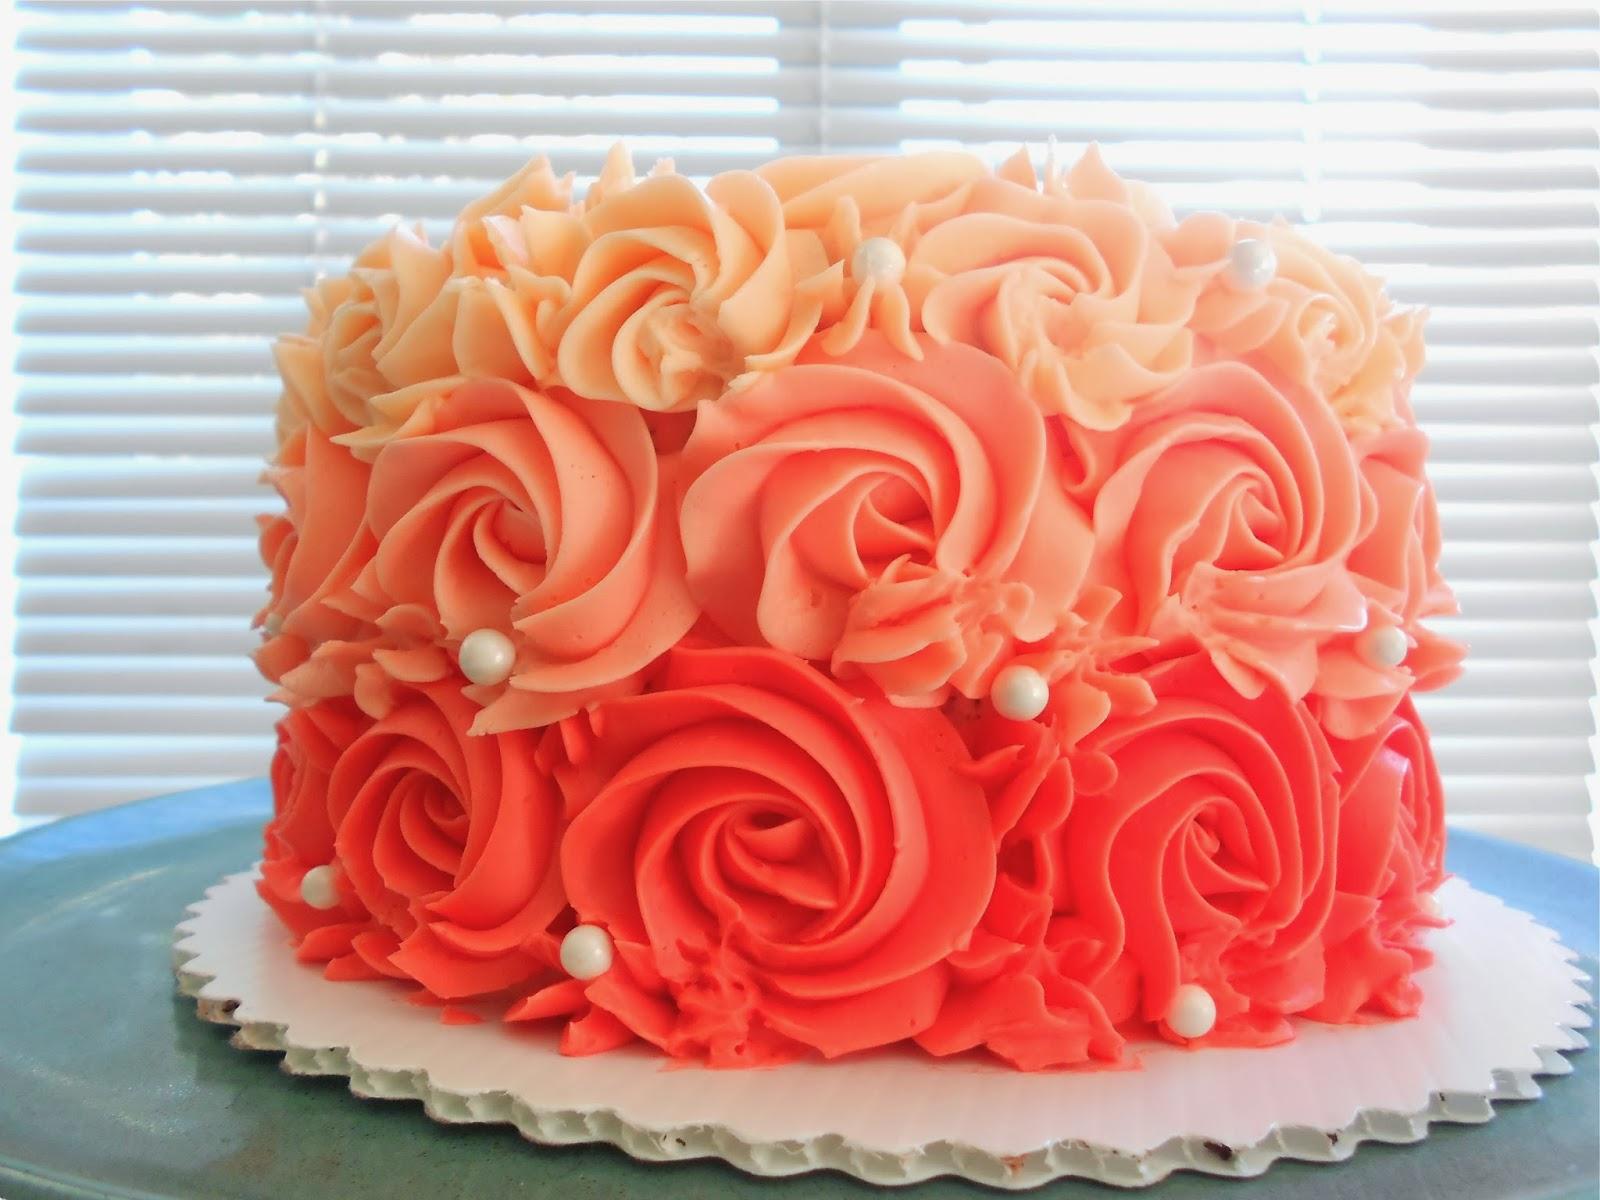 Custom Cakes By Lori 60th Ruffled Rose Birthday Cake Ombre Style